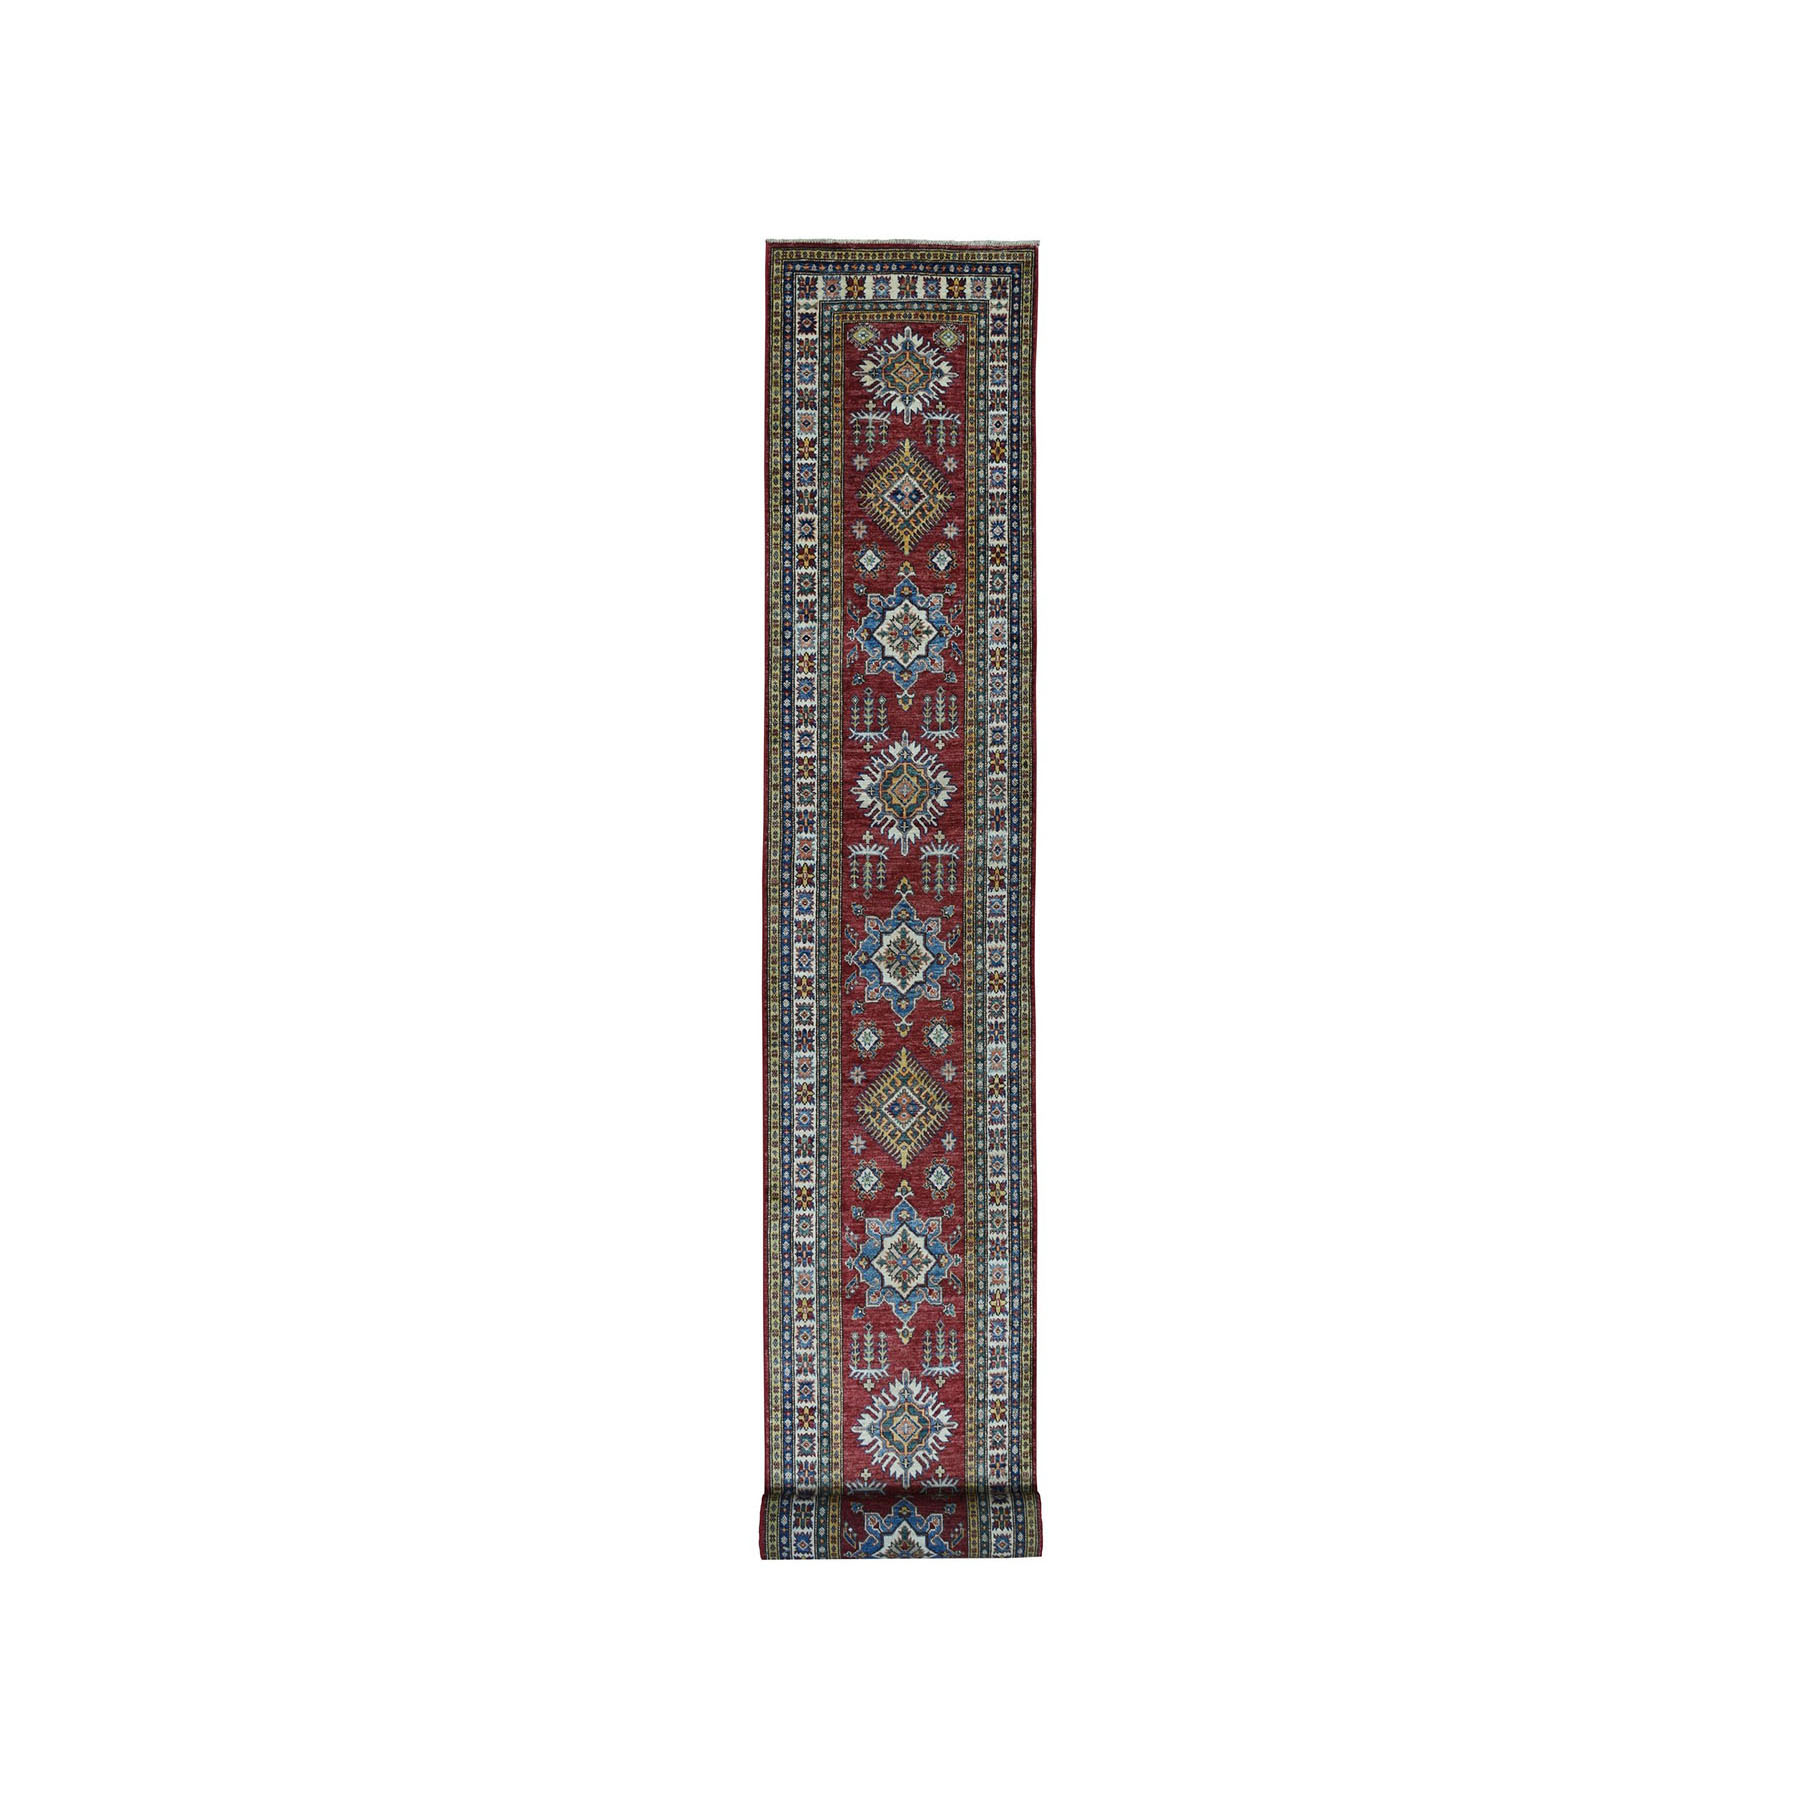 "2'7""X20'1"" Red Super Kazak Pure Wool Geometric Design Xl Runner Hand-Knotted Oriental Rug moae0e9e"